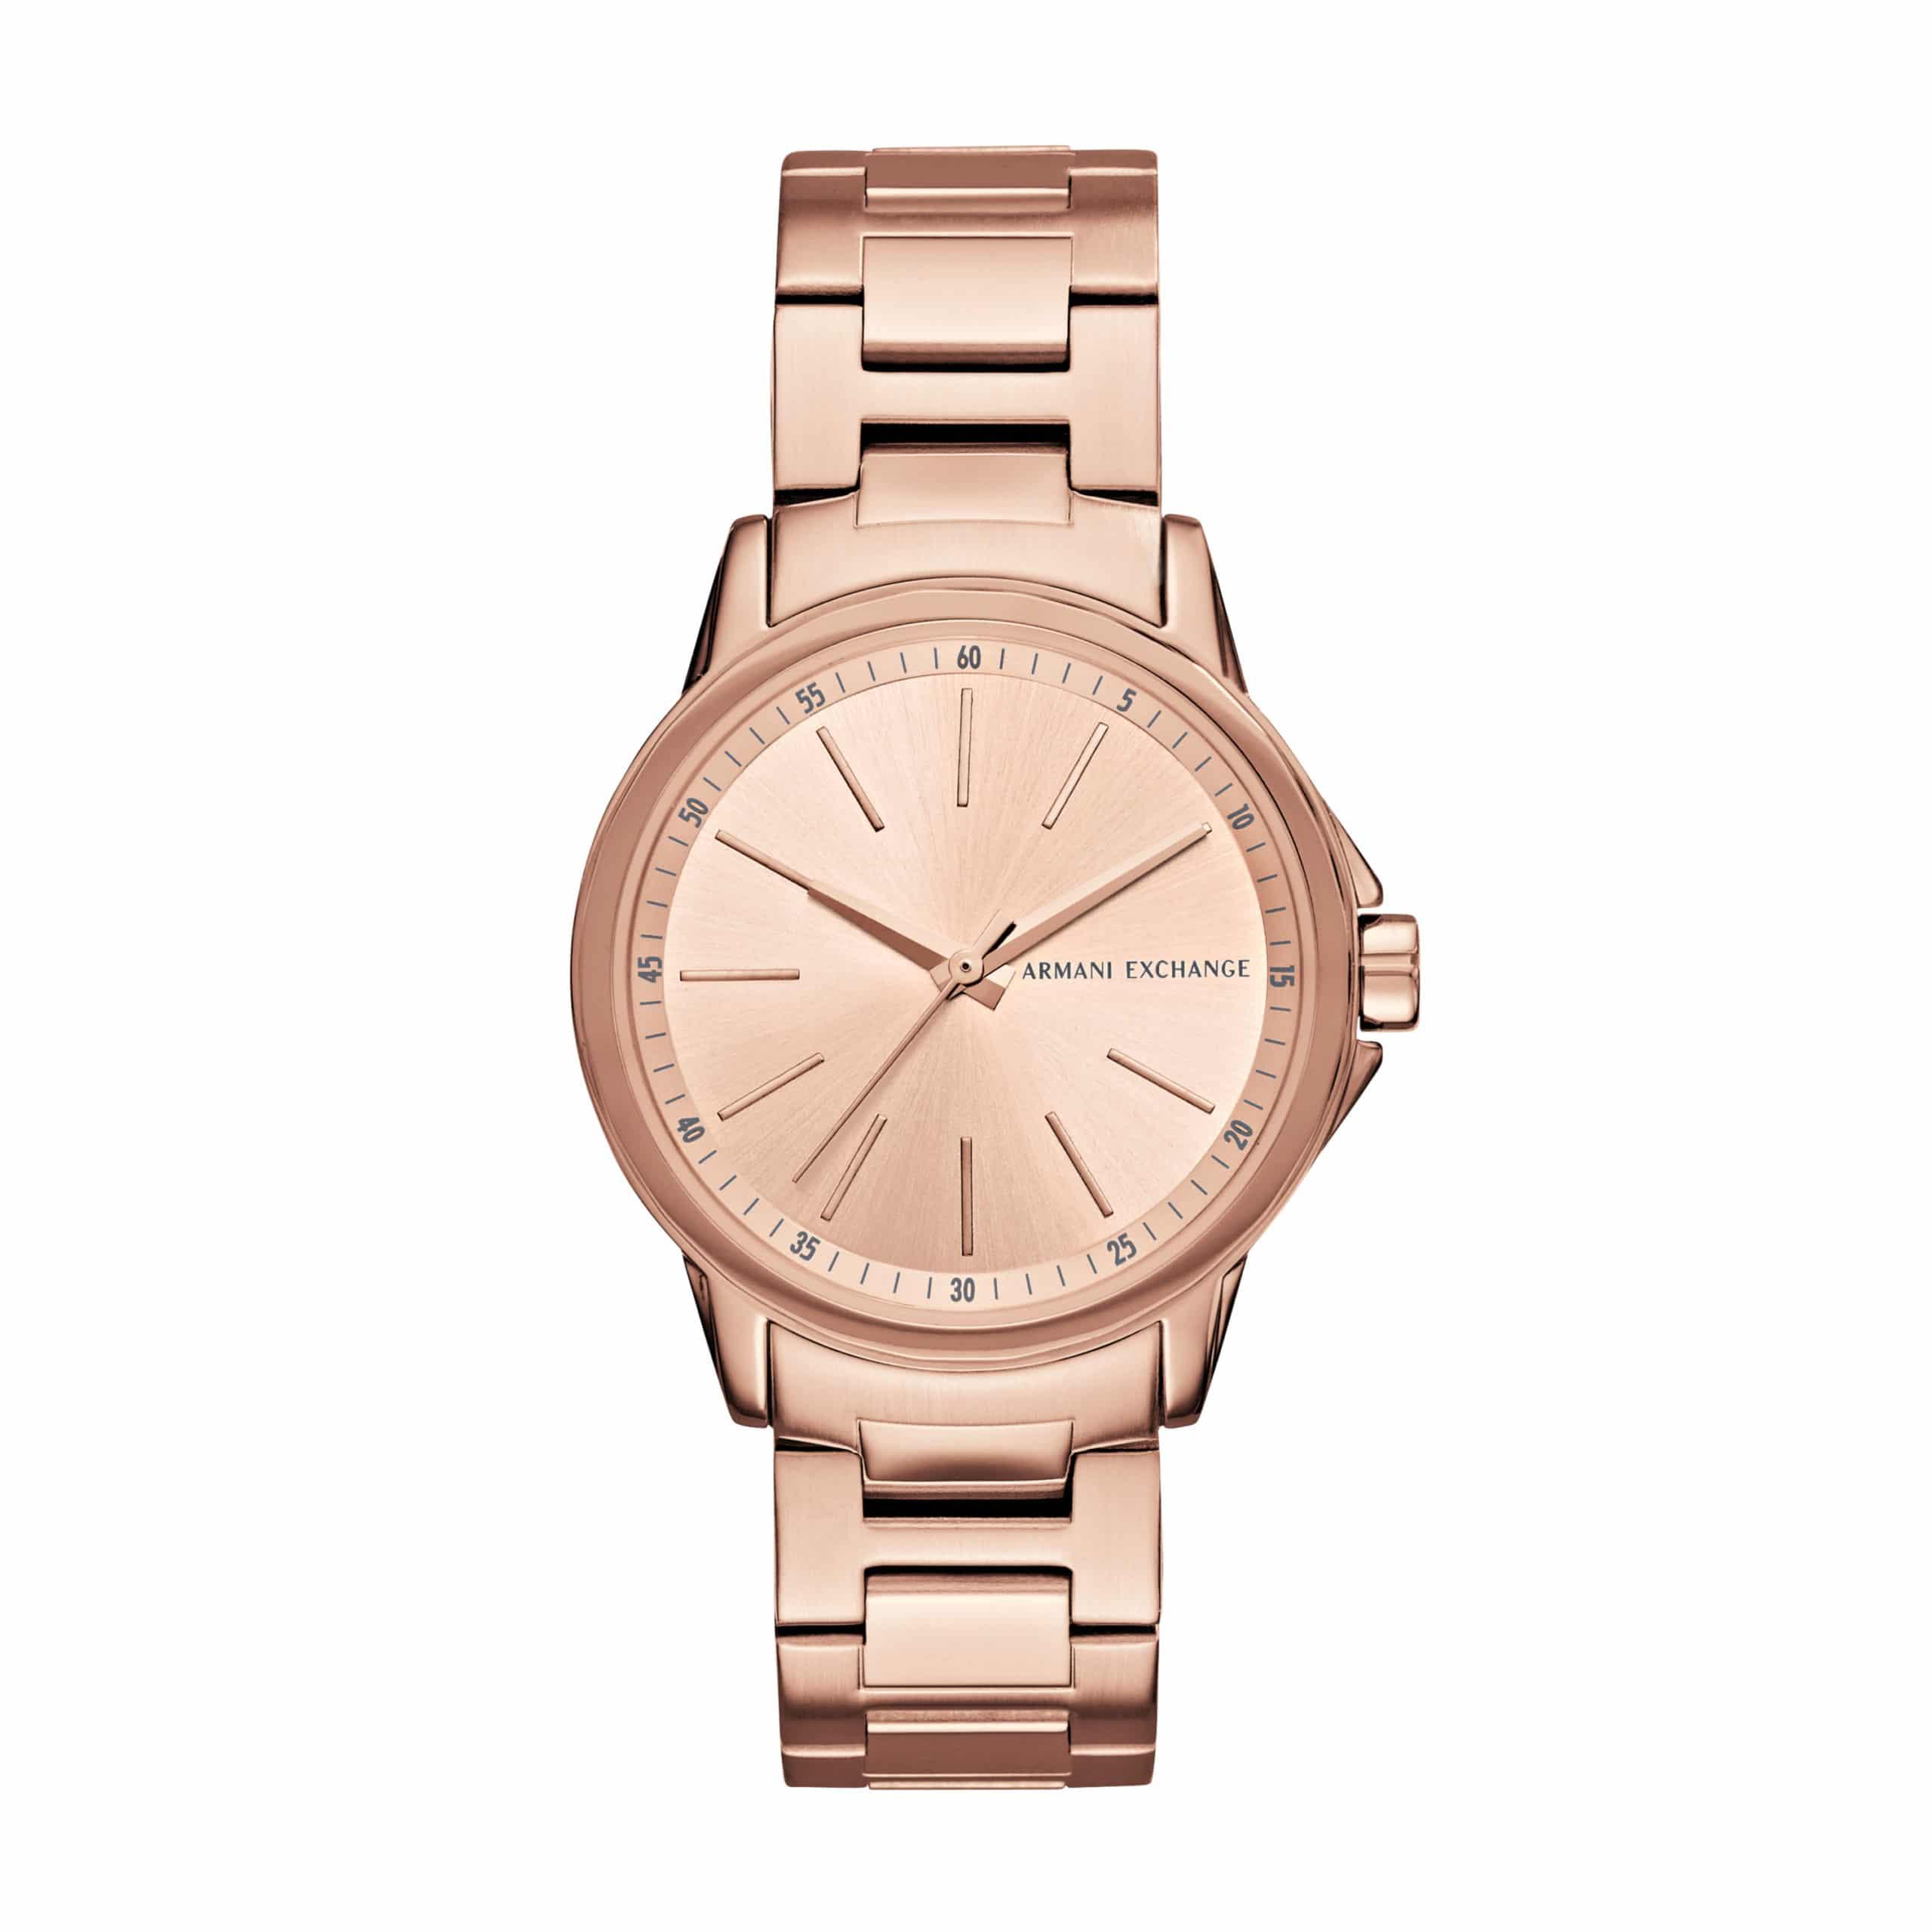 9f9a4f28420 Armani Exchange Lady Banks Women's Watch Rose Gold AX4347 - Sunlab Malta